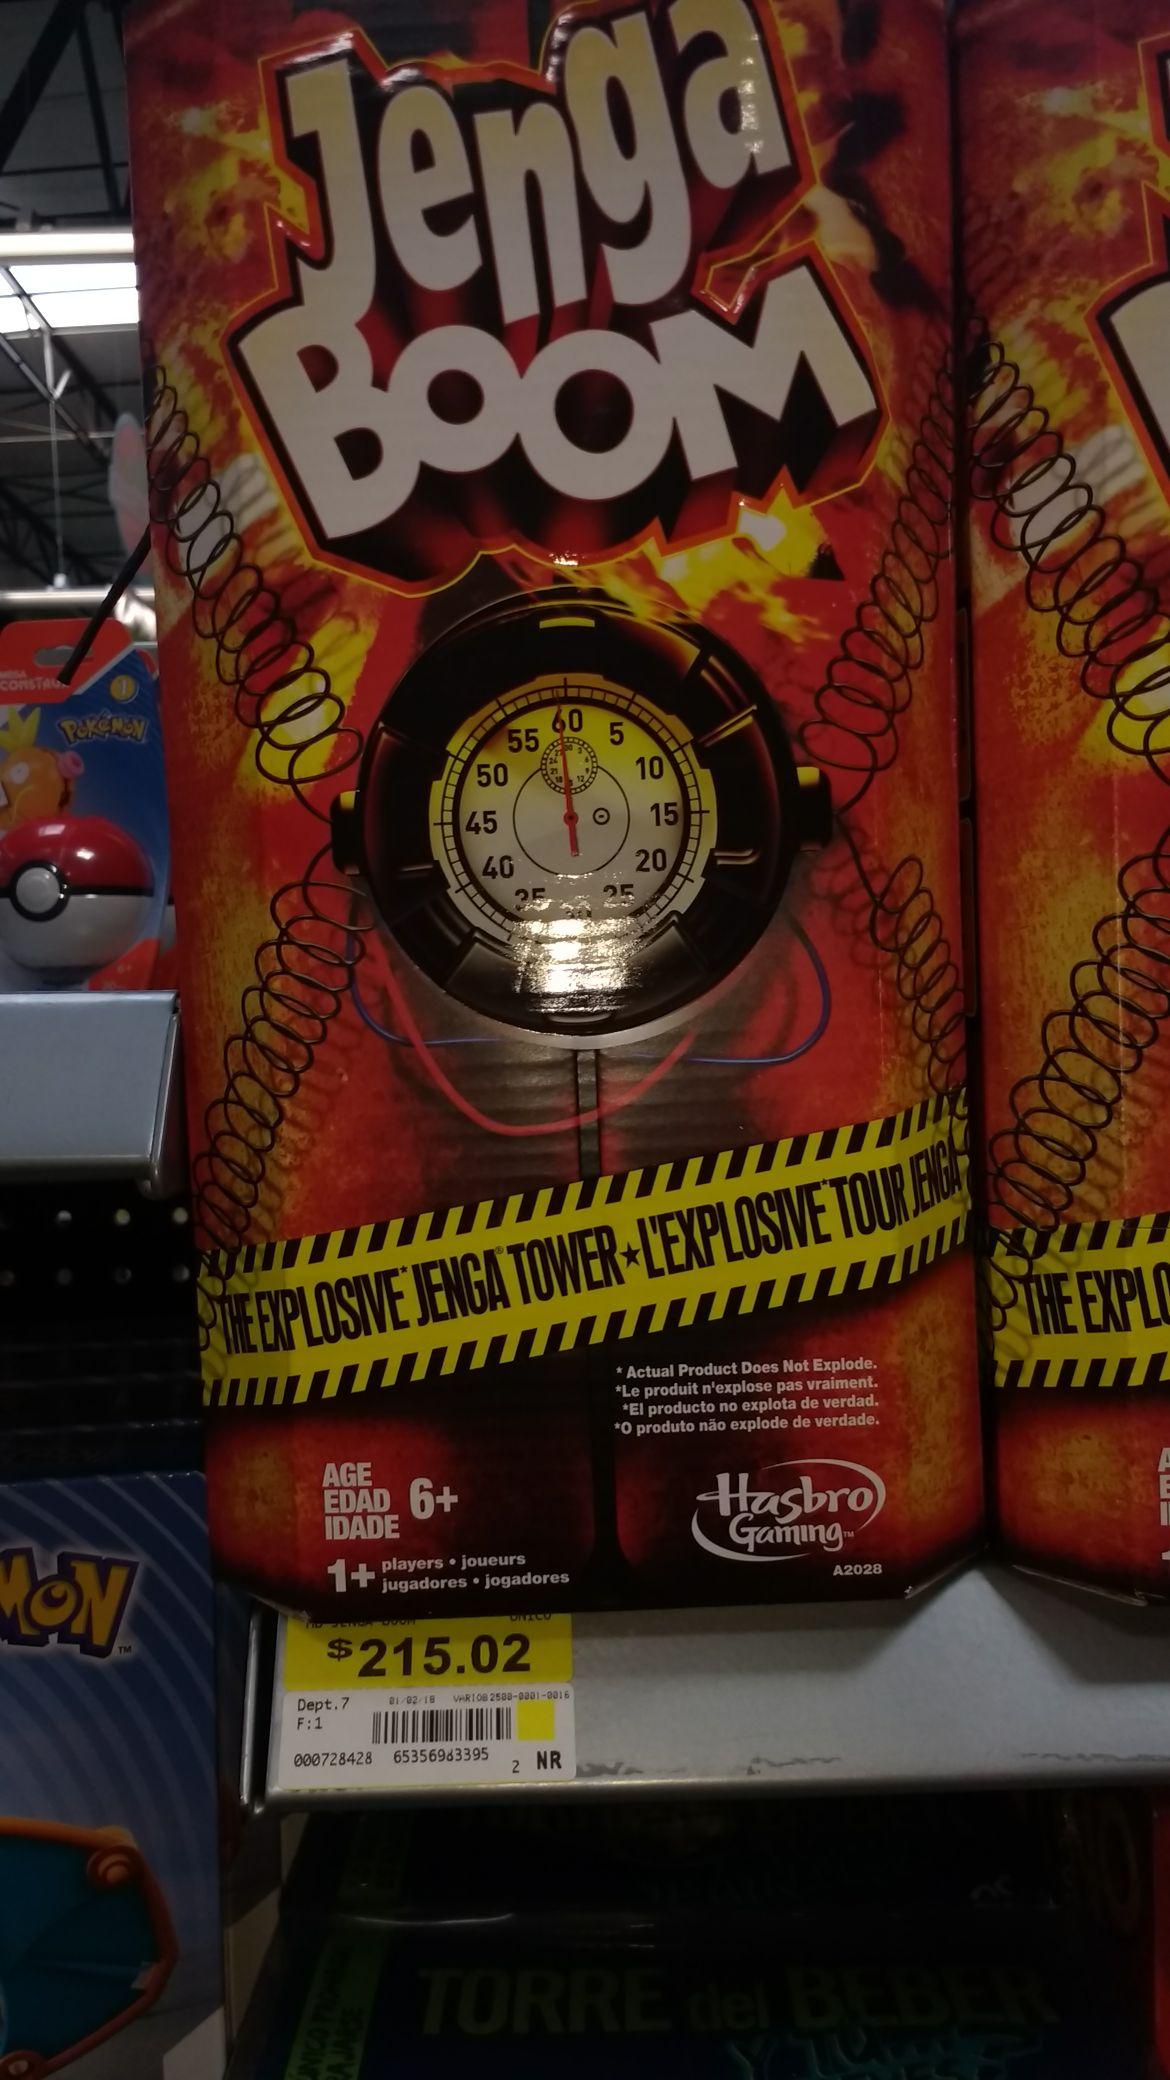 Bodega Aurrerá: Jenga boom en liquidación